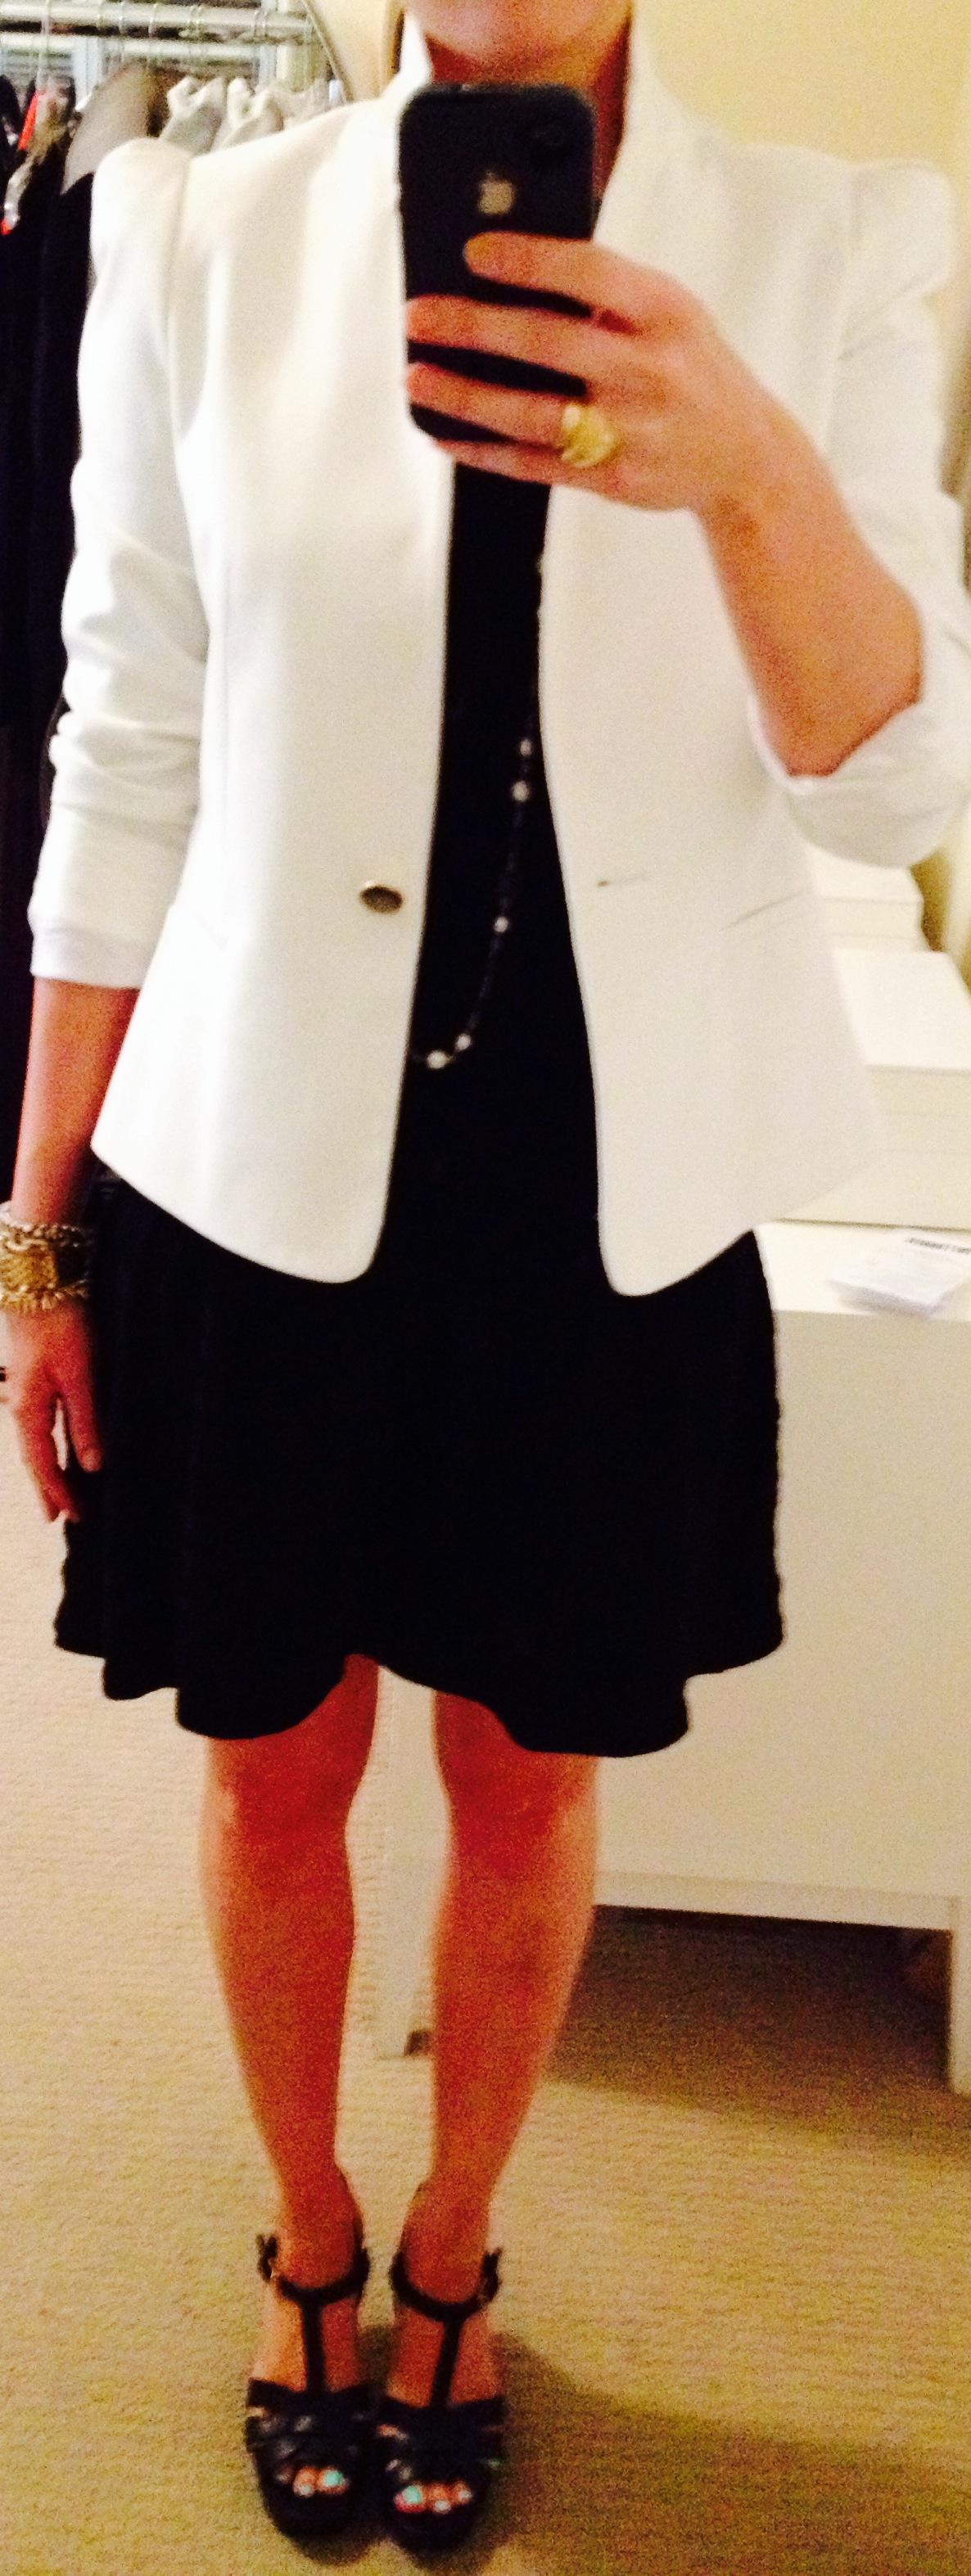 July 29, White Blazer over Black Knit Dress by Zara